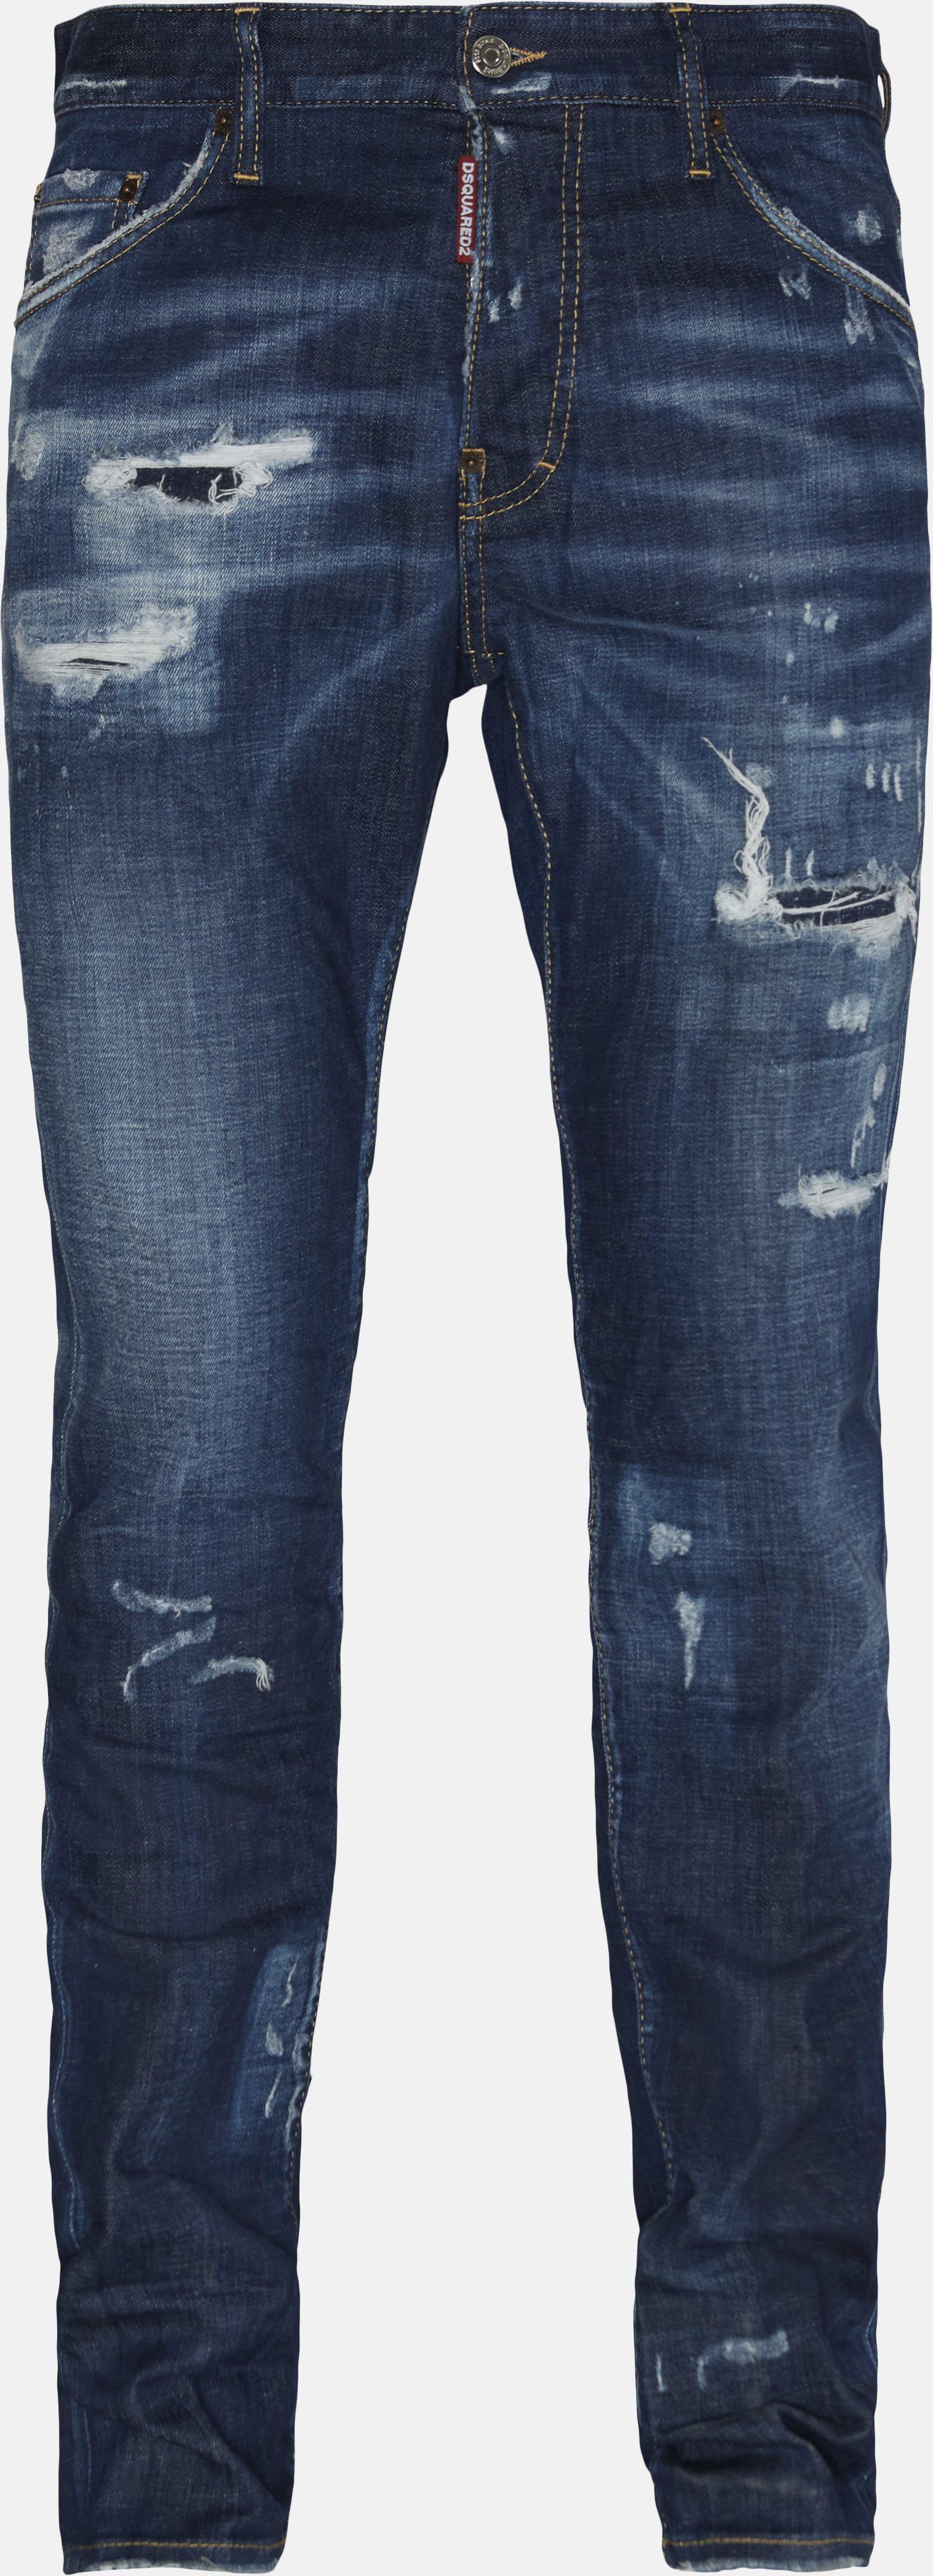 Cool Guy Jeans - Jeans - Slim fit - Denim